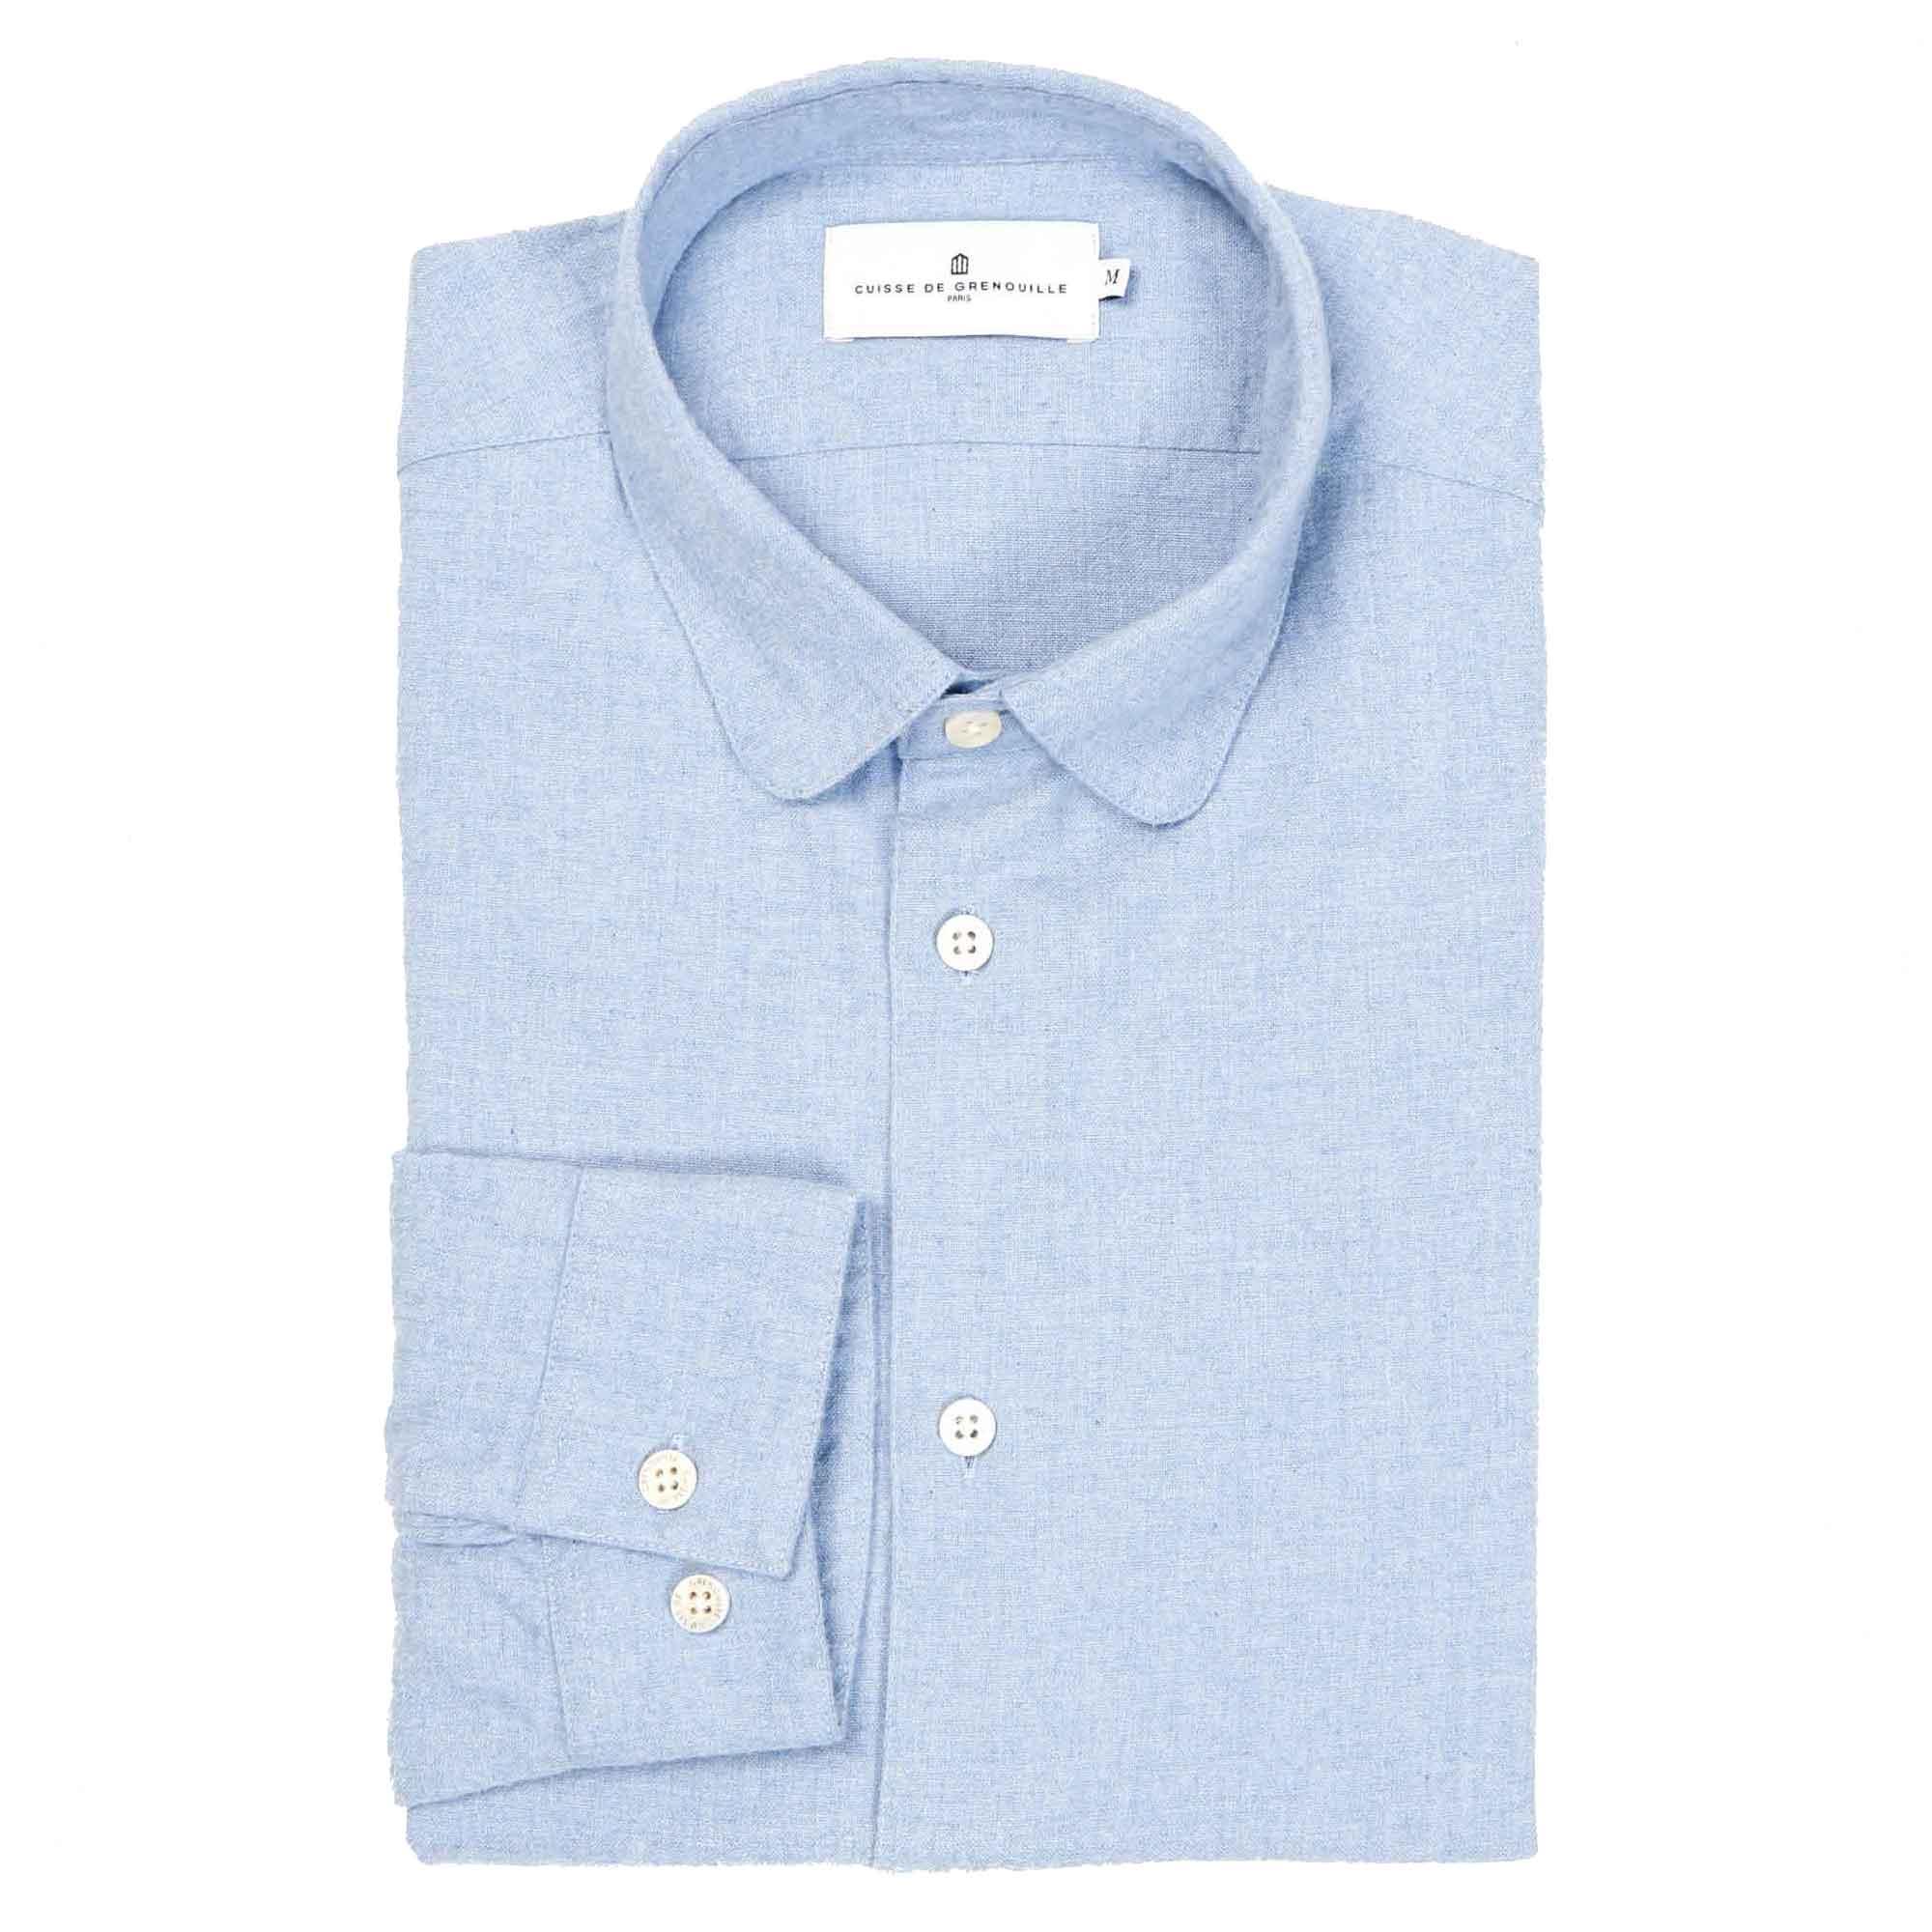 Camisa de franela azul claro